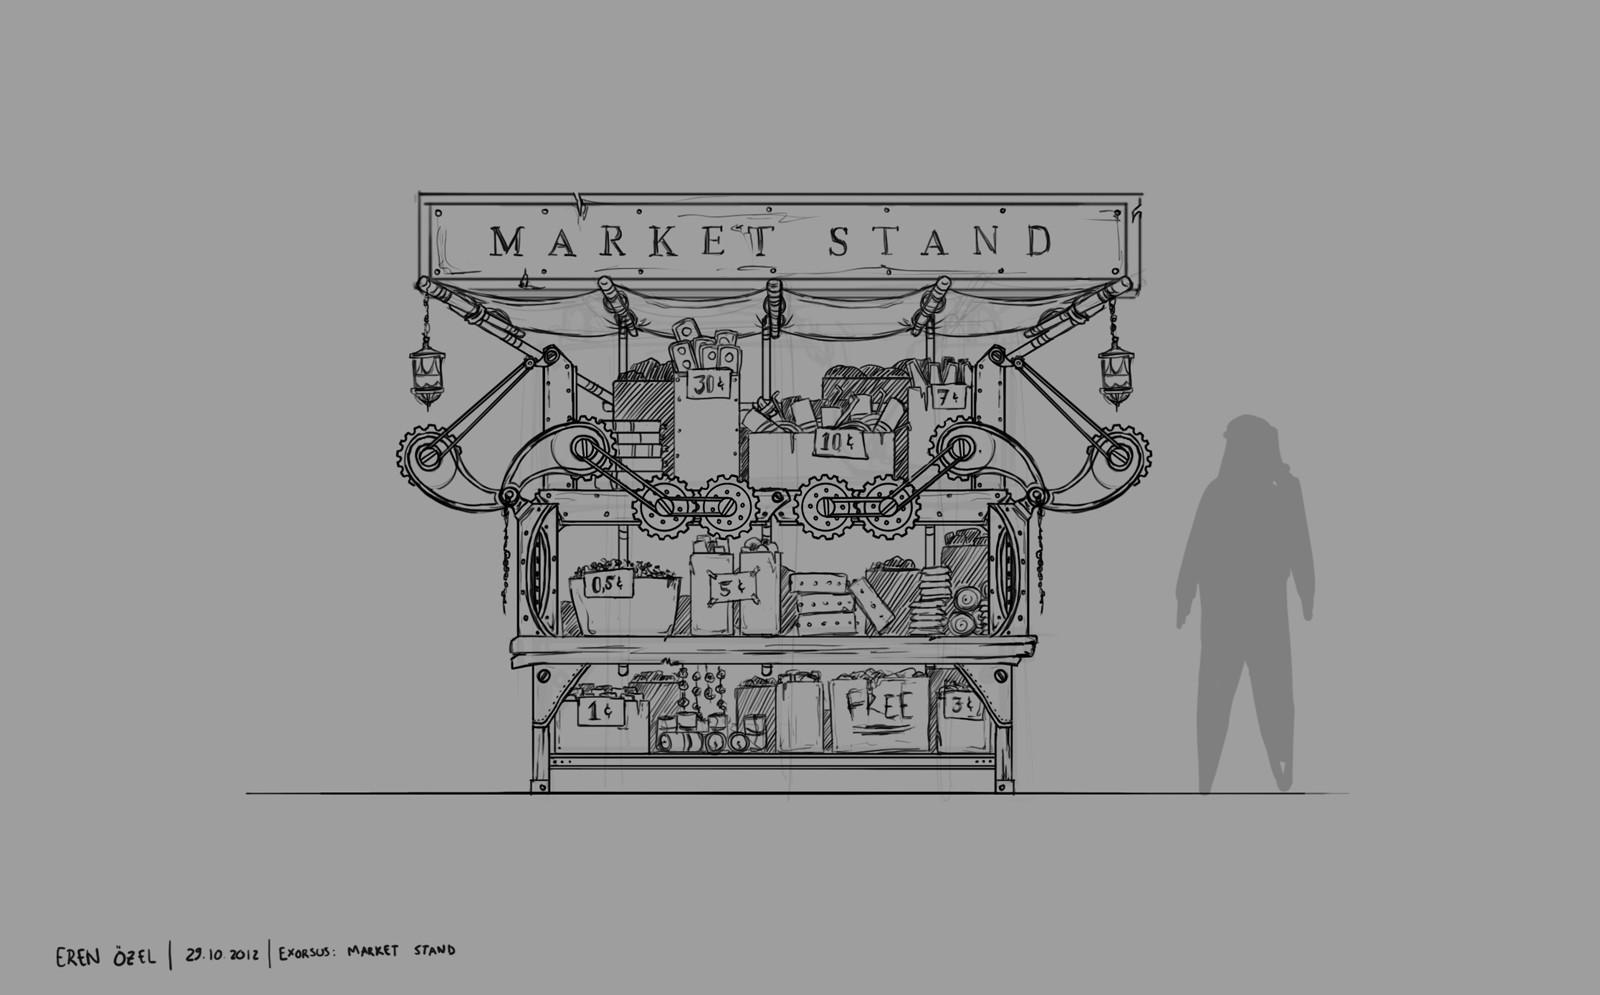 Eren ozel market stand 1600x995